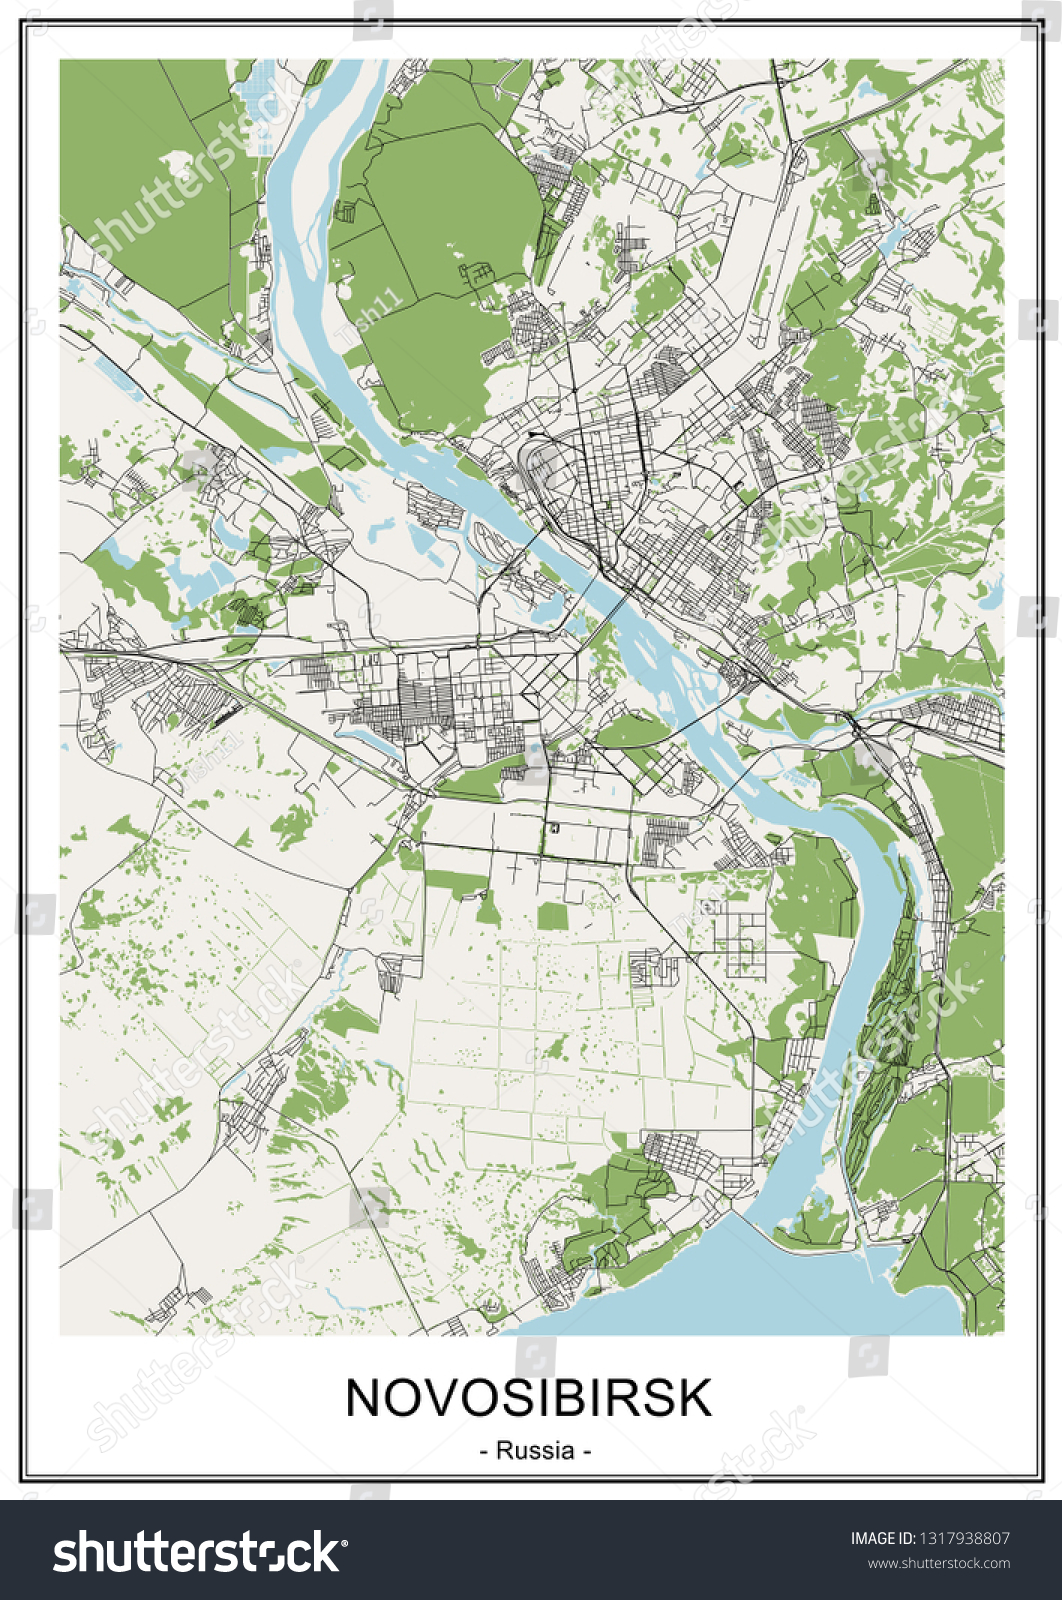 Picture of: Vector De Stock Libre De Regalias Sobre Vector Map City Novosibirsk Siberia Russia1317938807